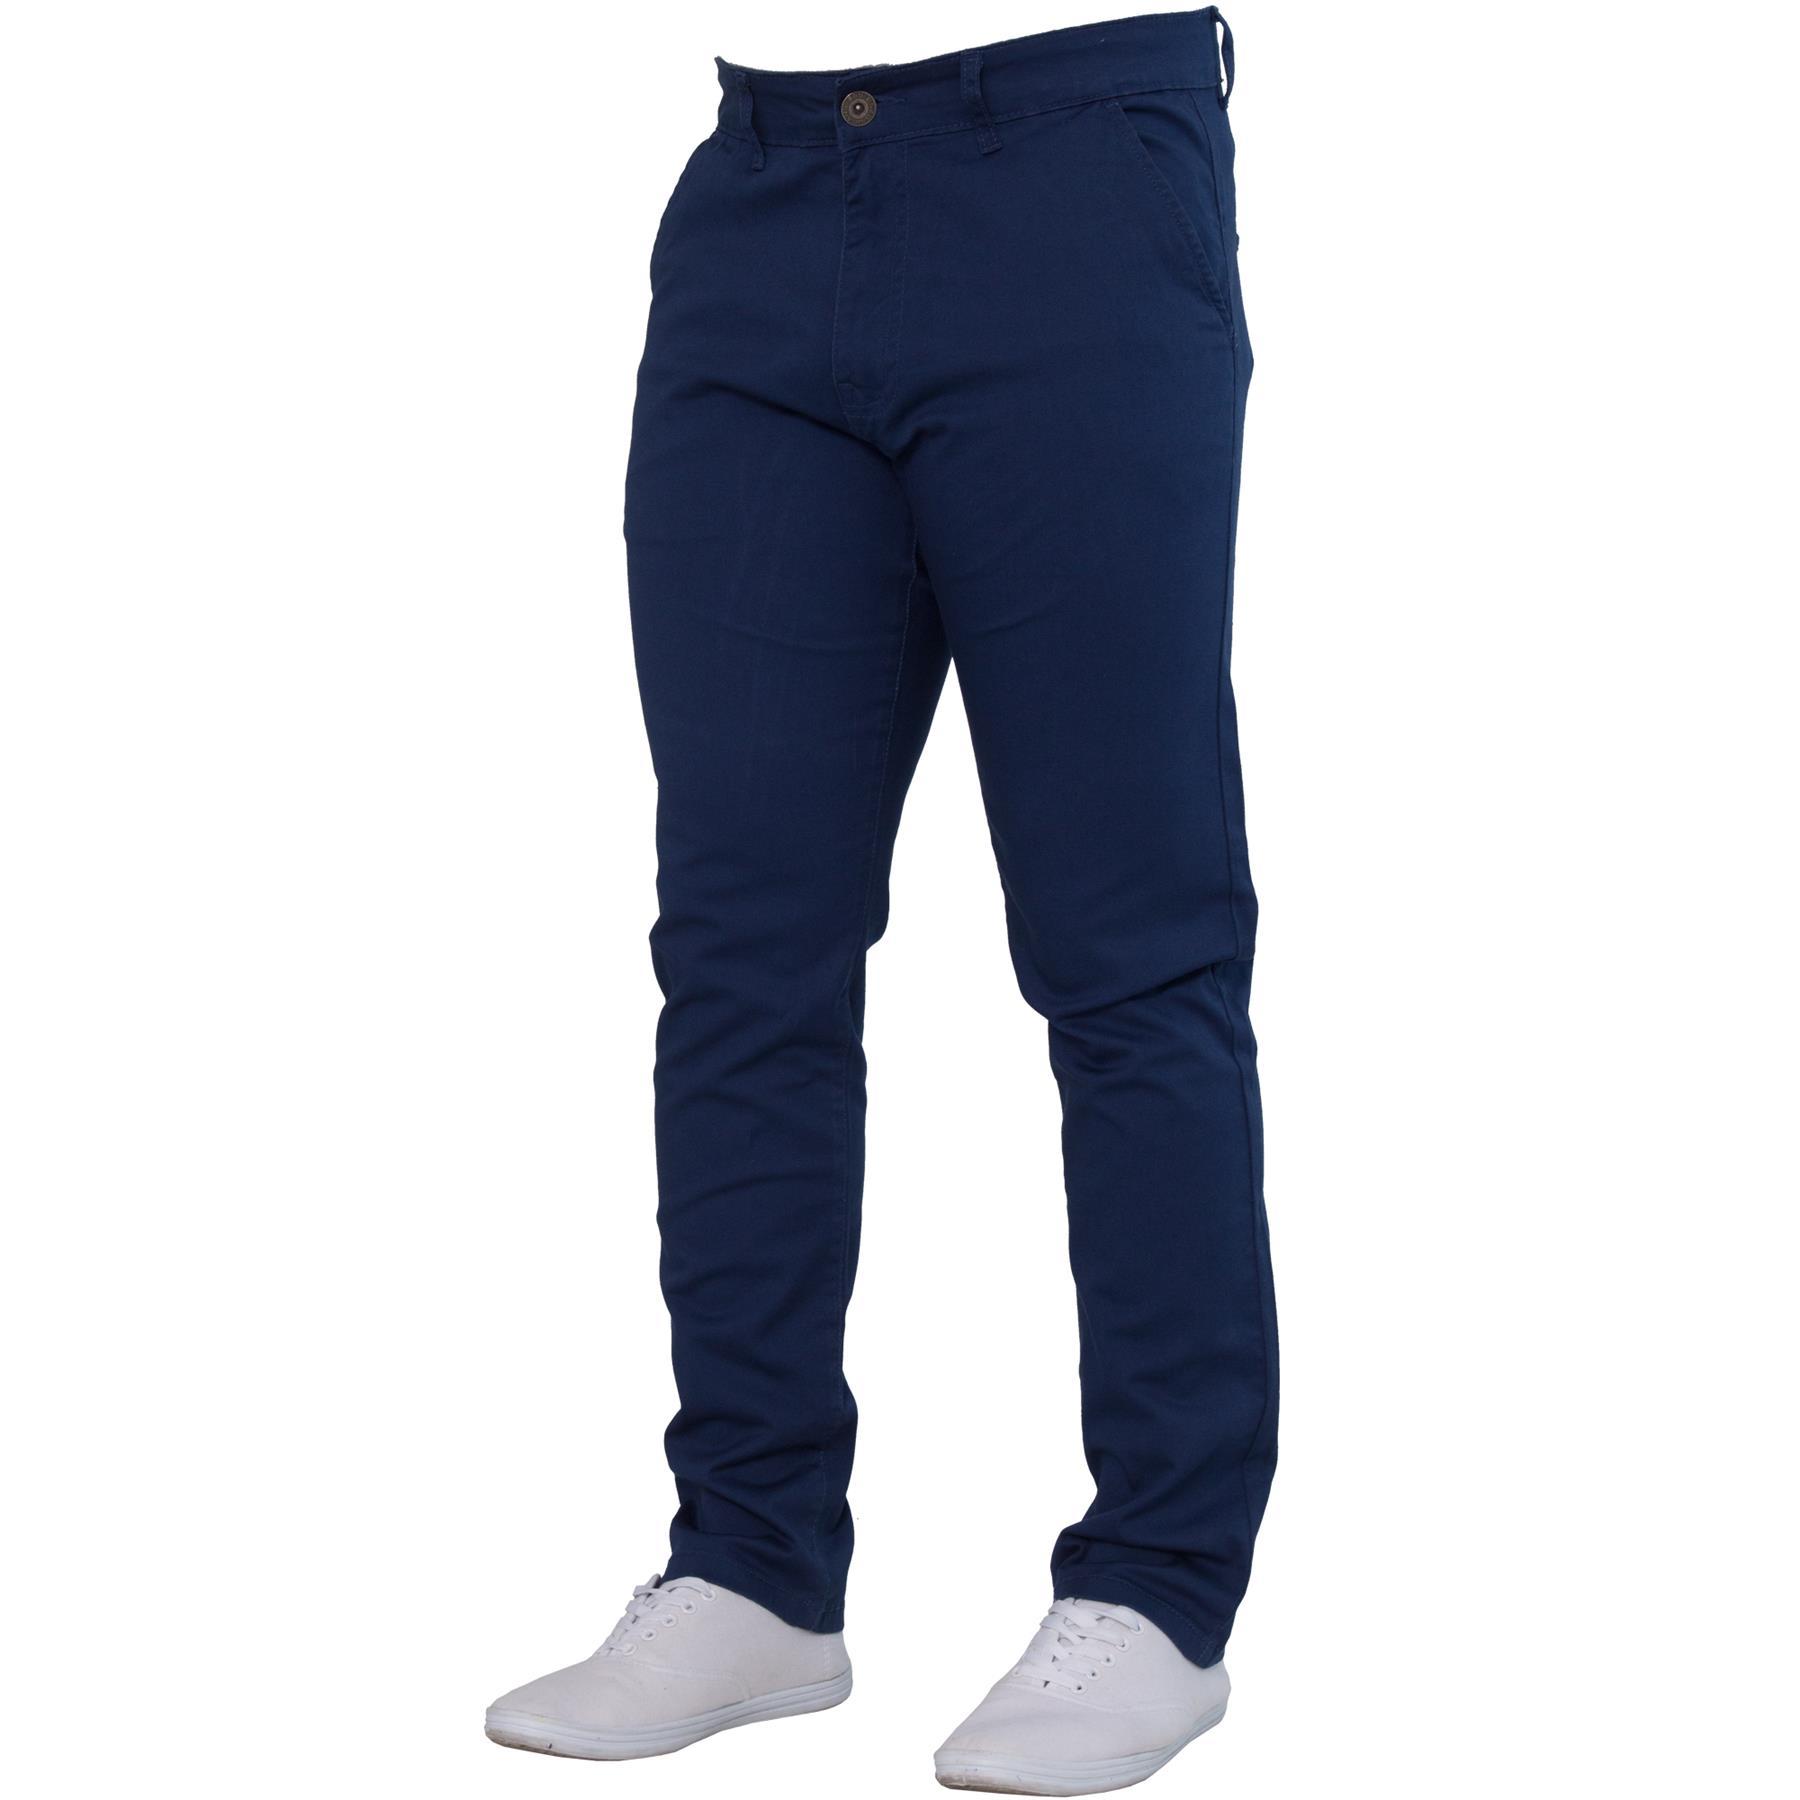 ENZO-Jeans-para-hombre-Big-Alto-Pierna-King-Size-Jeans-Pantalones-Chino-Pantalones-Pantalones-44-034 miniatura 8